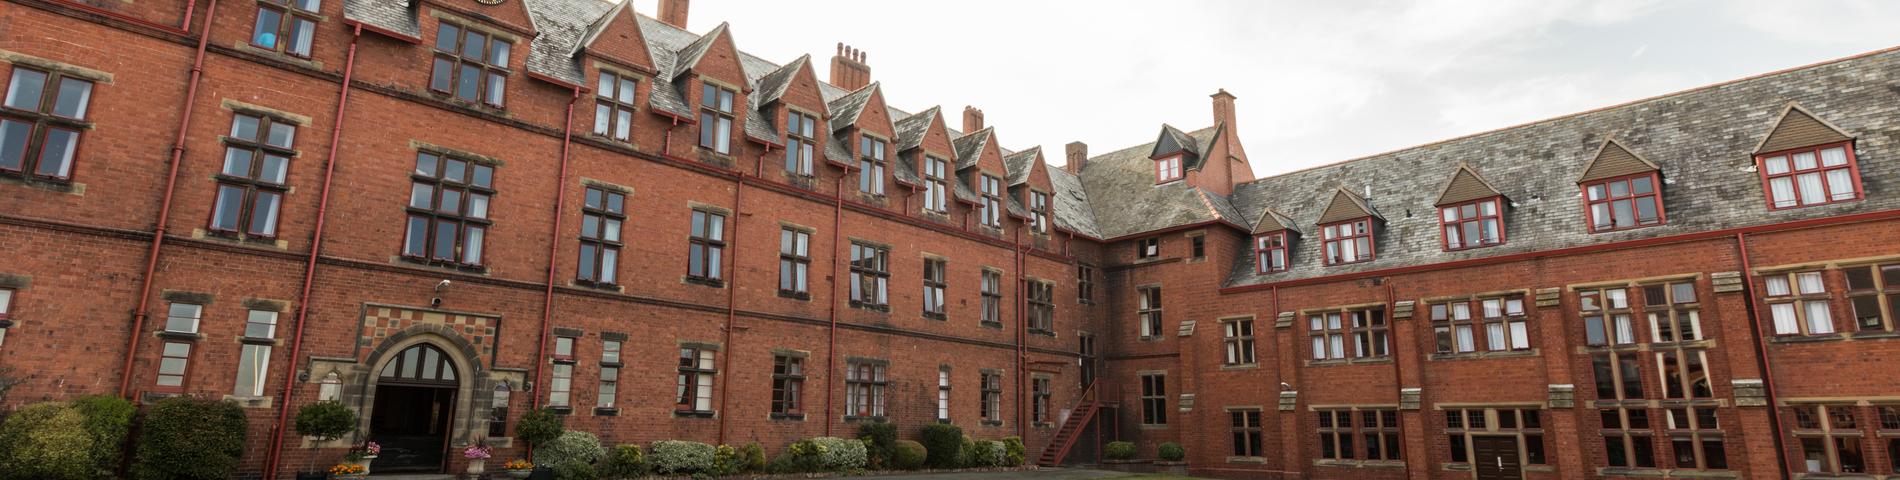 International House Ellesmere Junior centre รูปภาพ 1